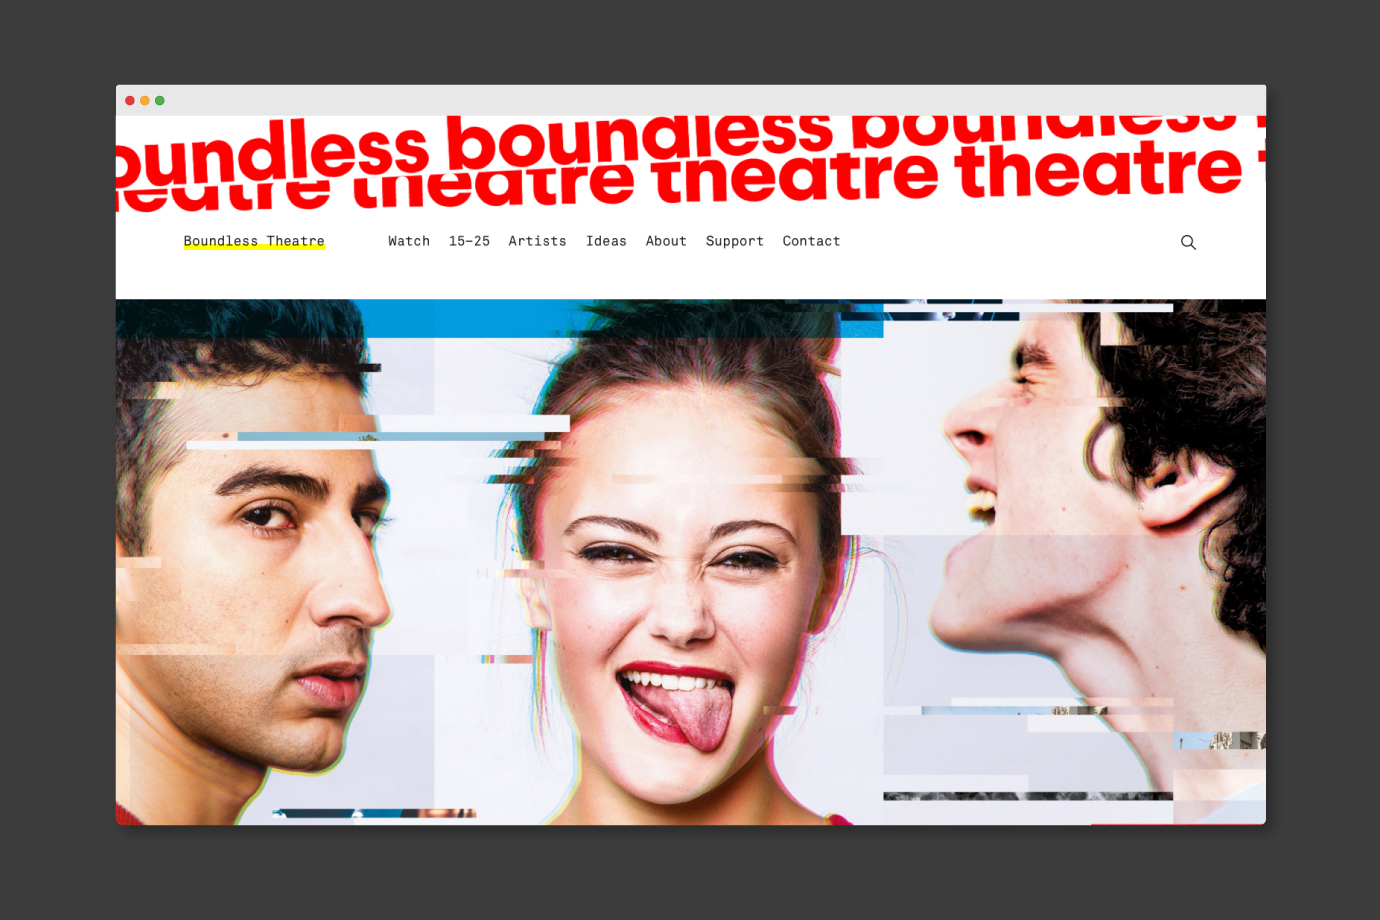 http://spystudio.co.uk/wp-content/uploads/2017/04/Boundless_Theatre_web-1.jpg